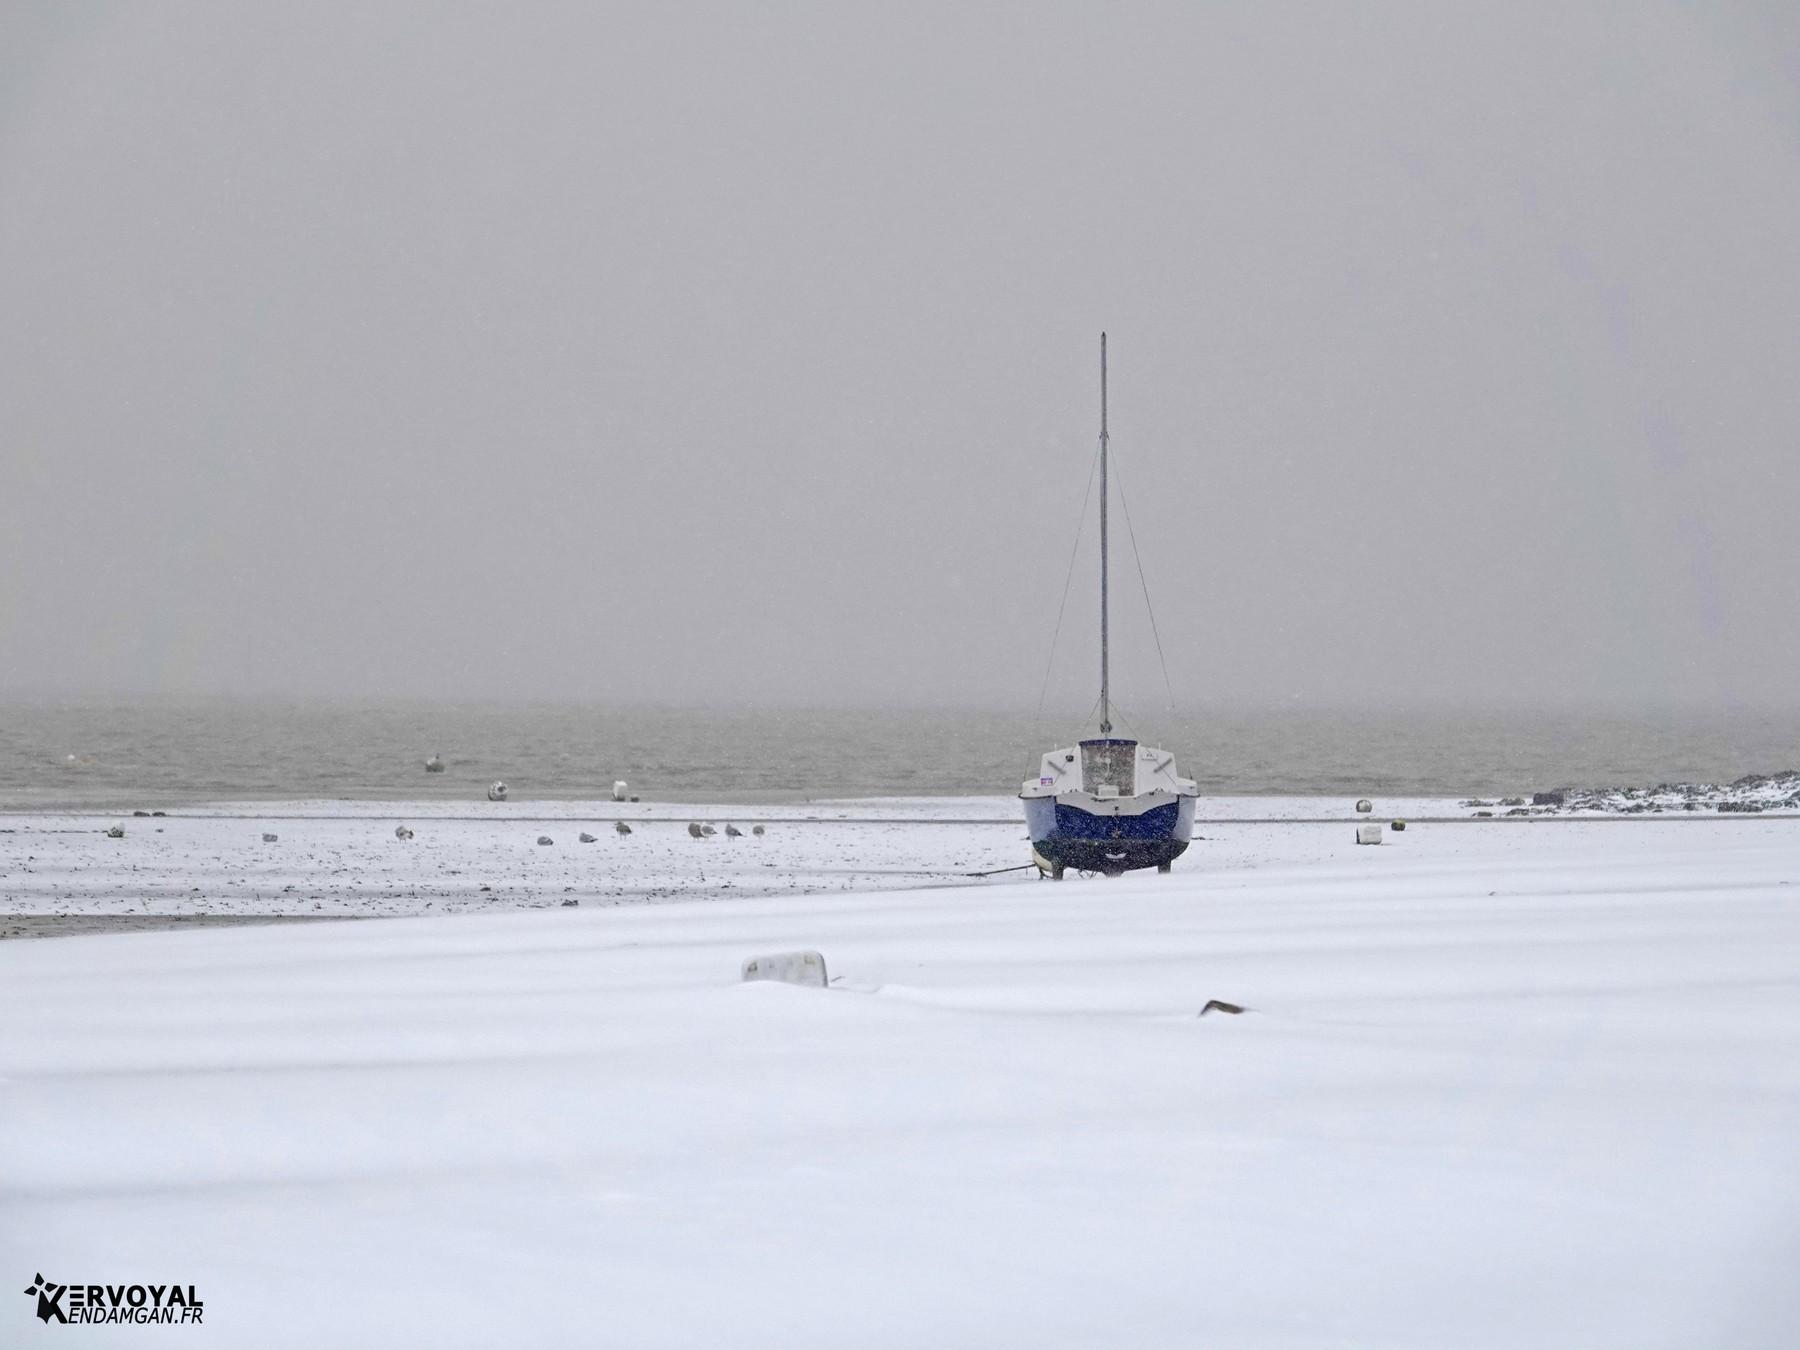 neige à kervoyal 11 février 2021 damgan morbihan (39)